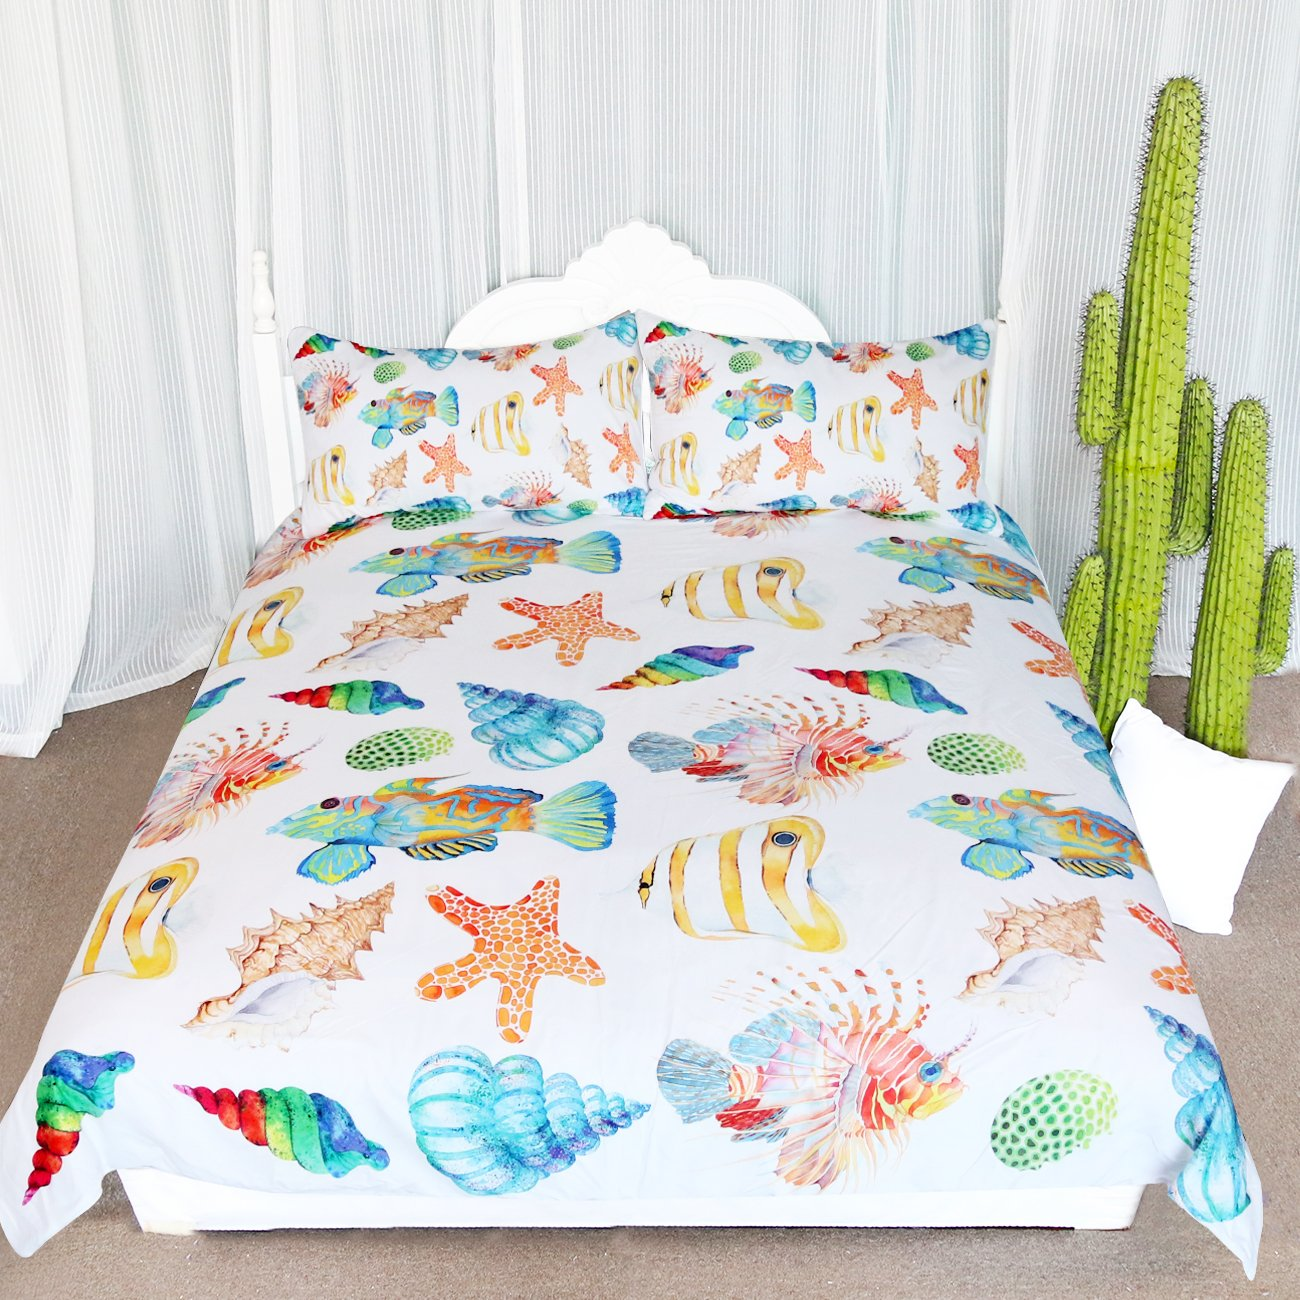 ARIGHTEX Cute Ocean Creatures Bedding, Seashell Bedding Duvet Cover Set, Beach Themed Duvet Covers (Queen)